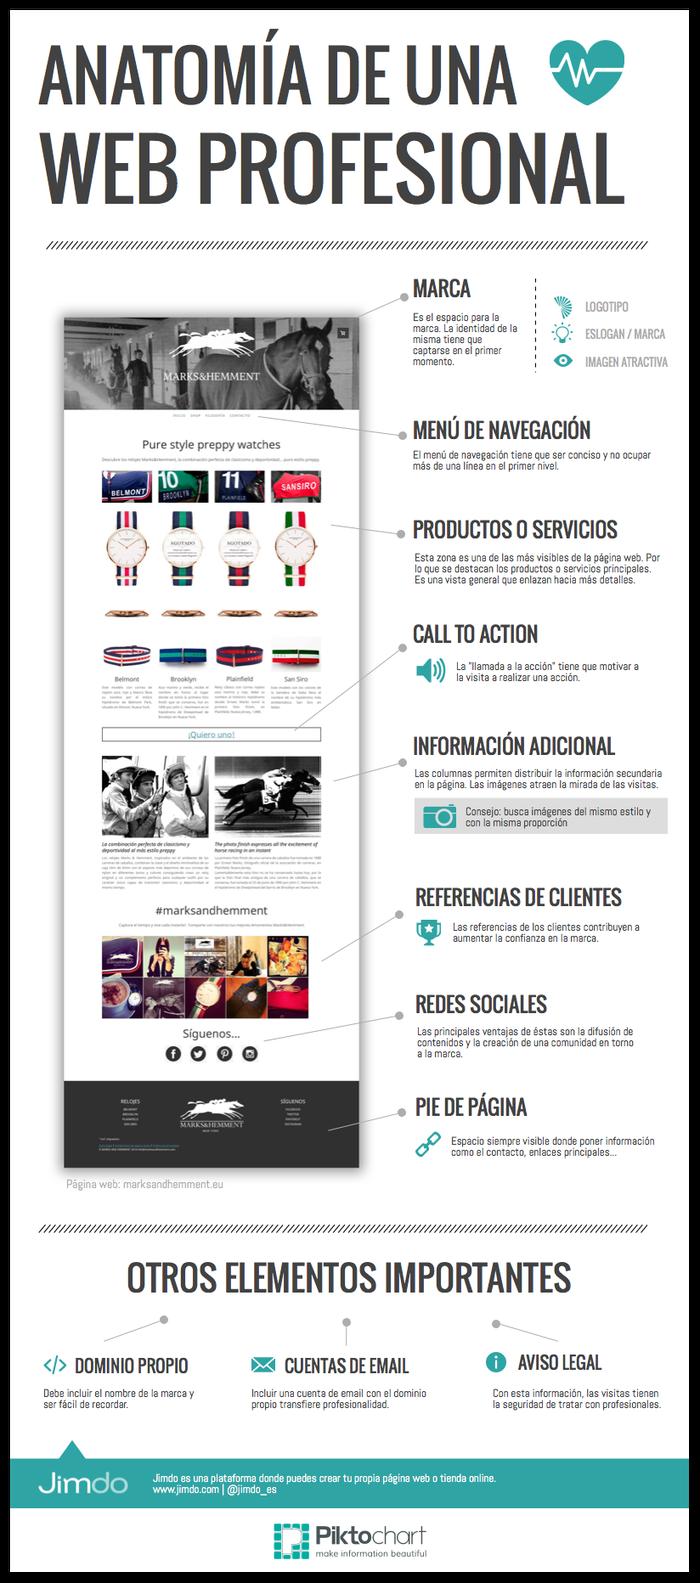 Anatomía de una web profesional #infografia #infographic | tips de ...